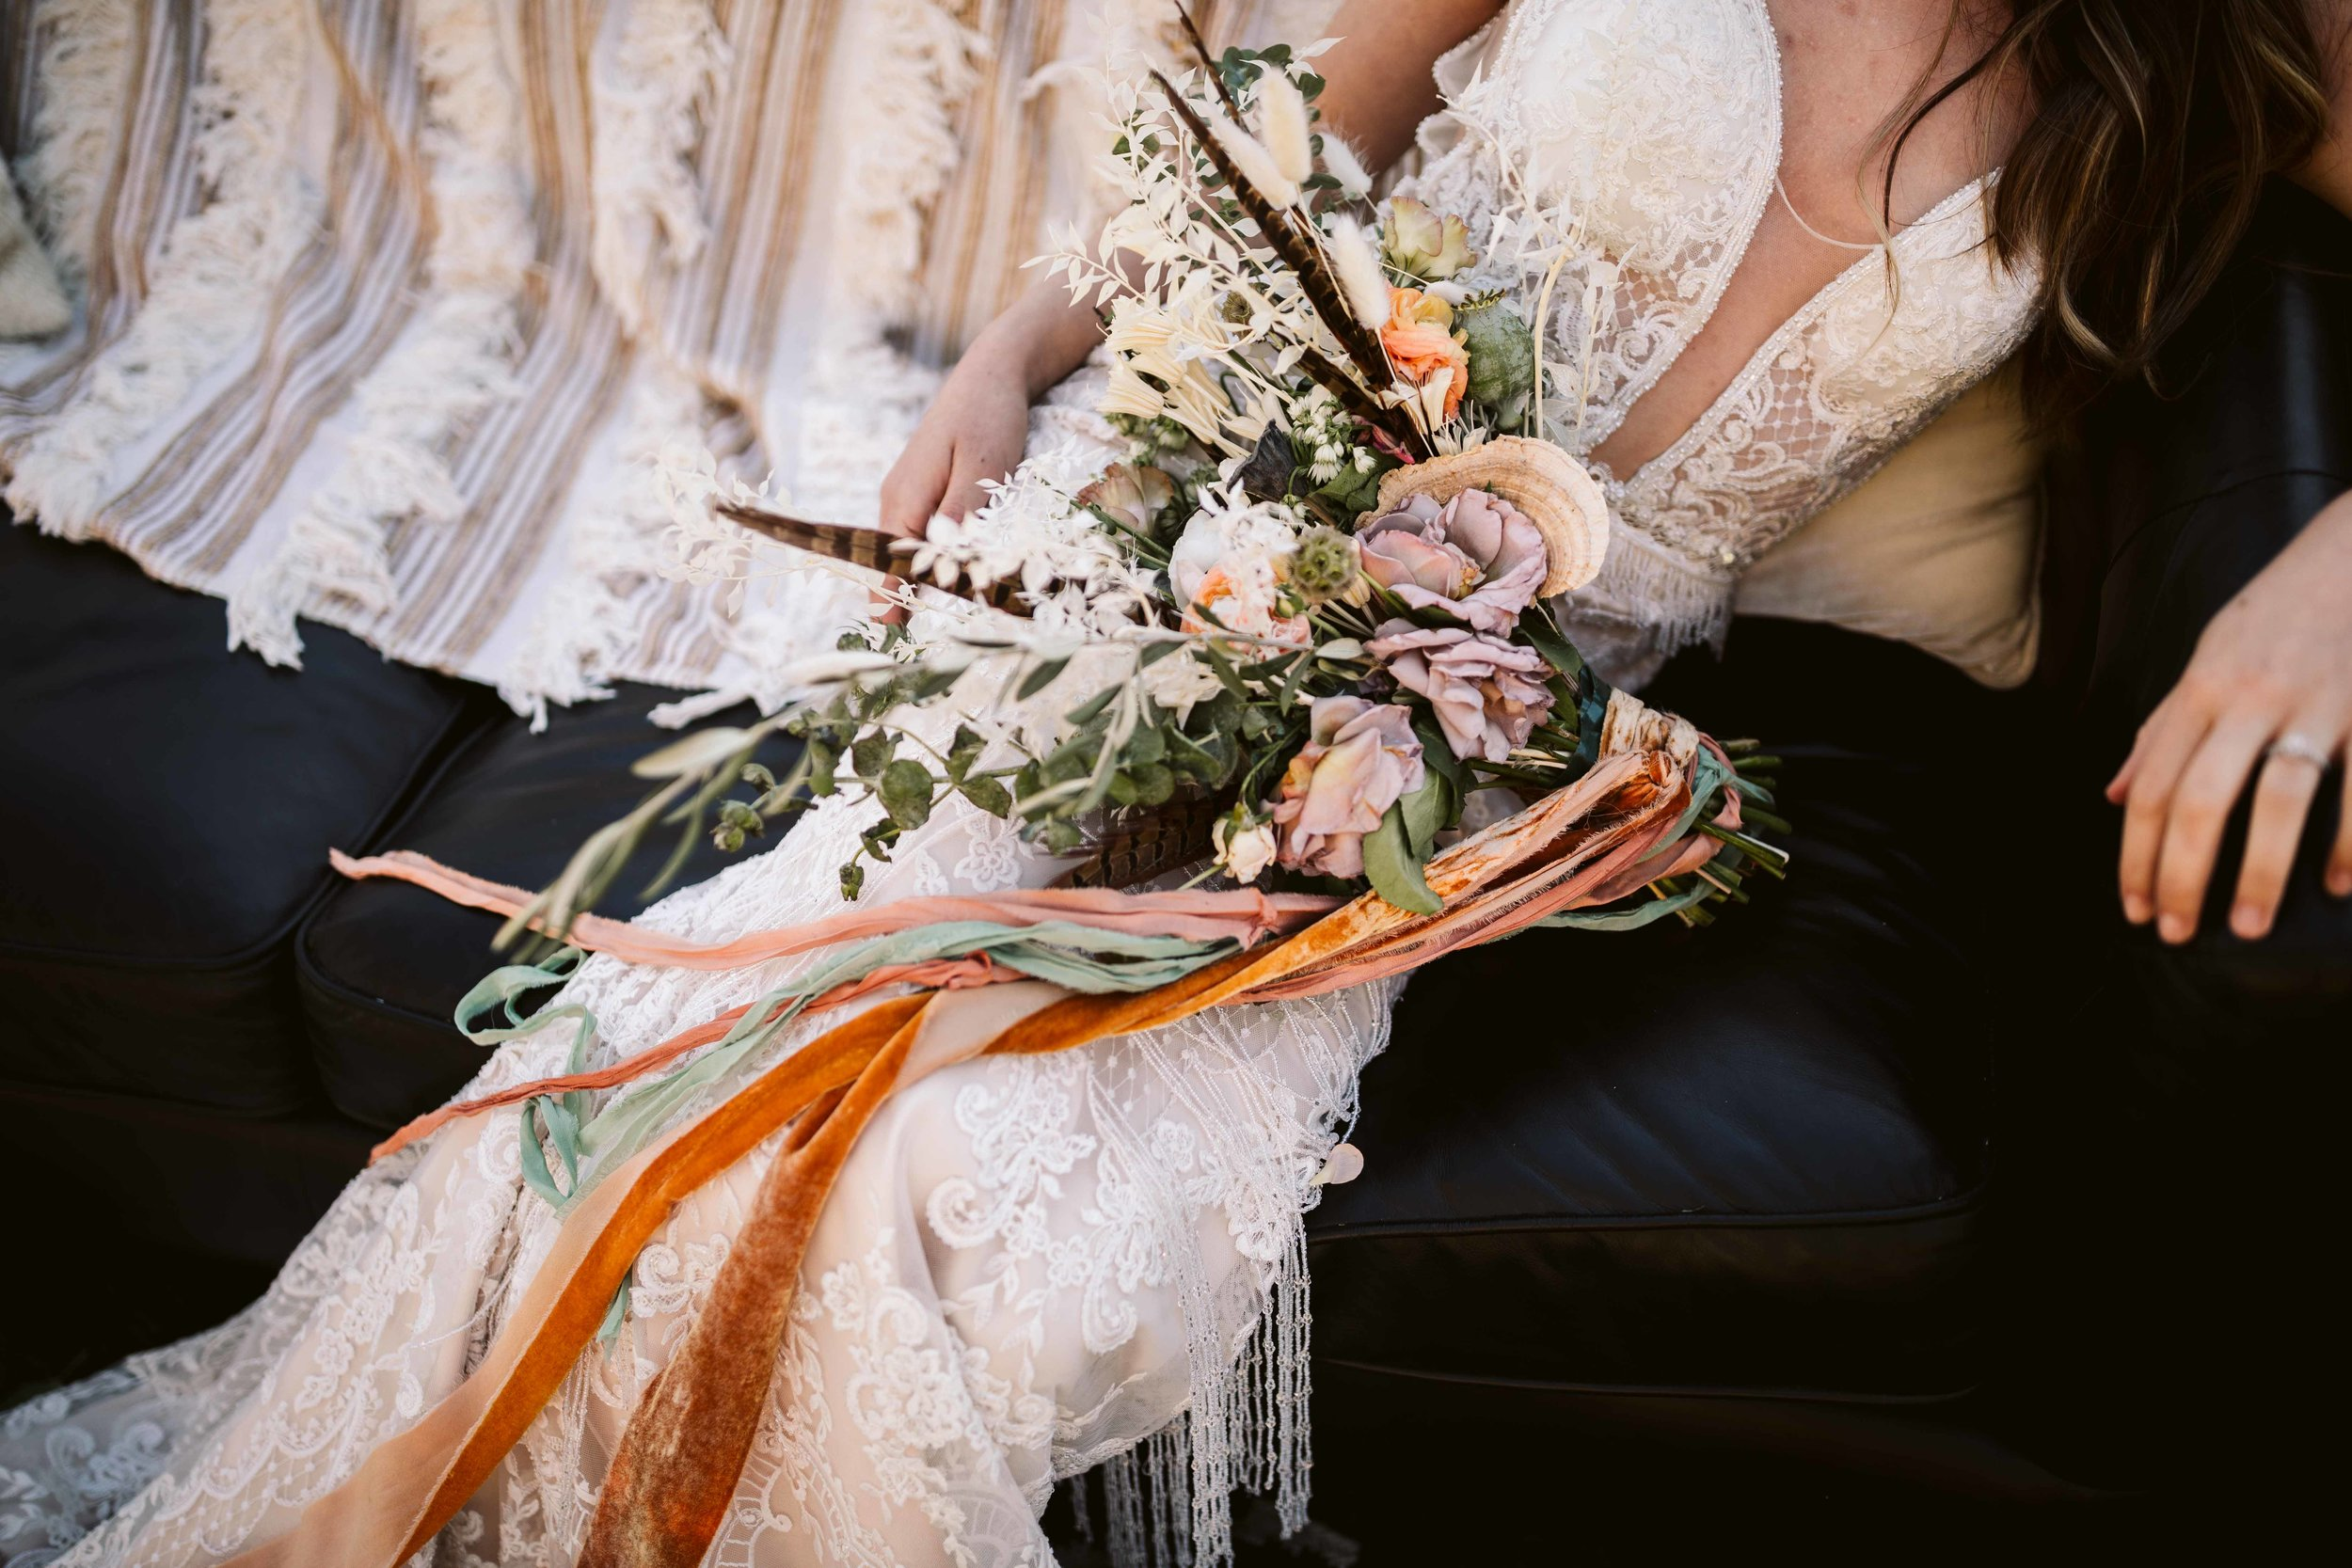 bend-oregon-wedding-photographer-66.jpg